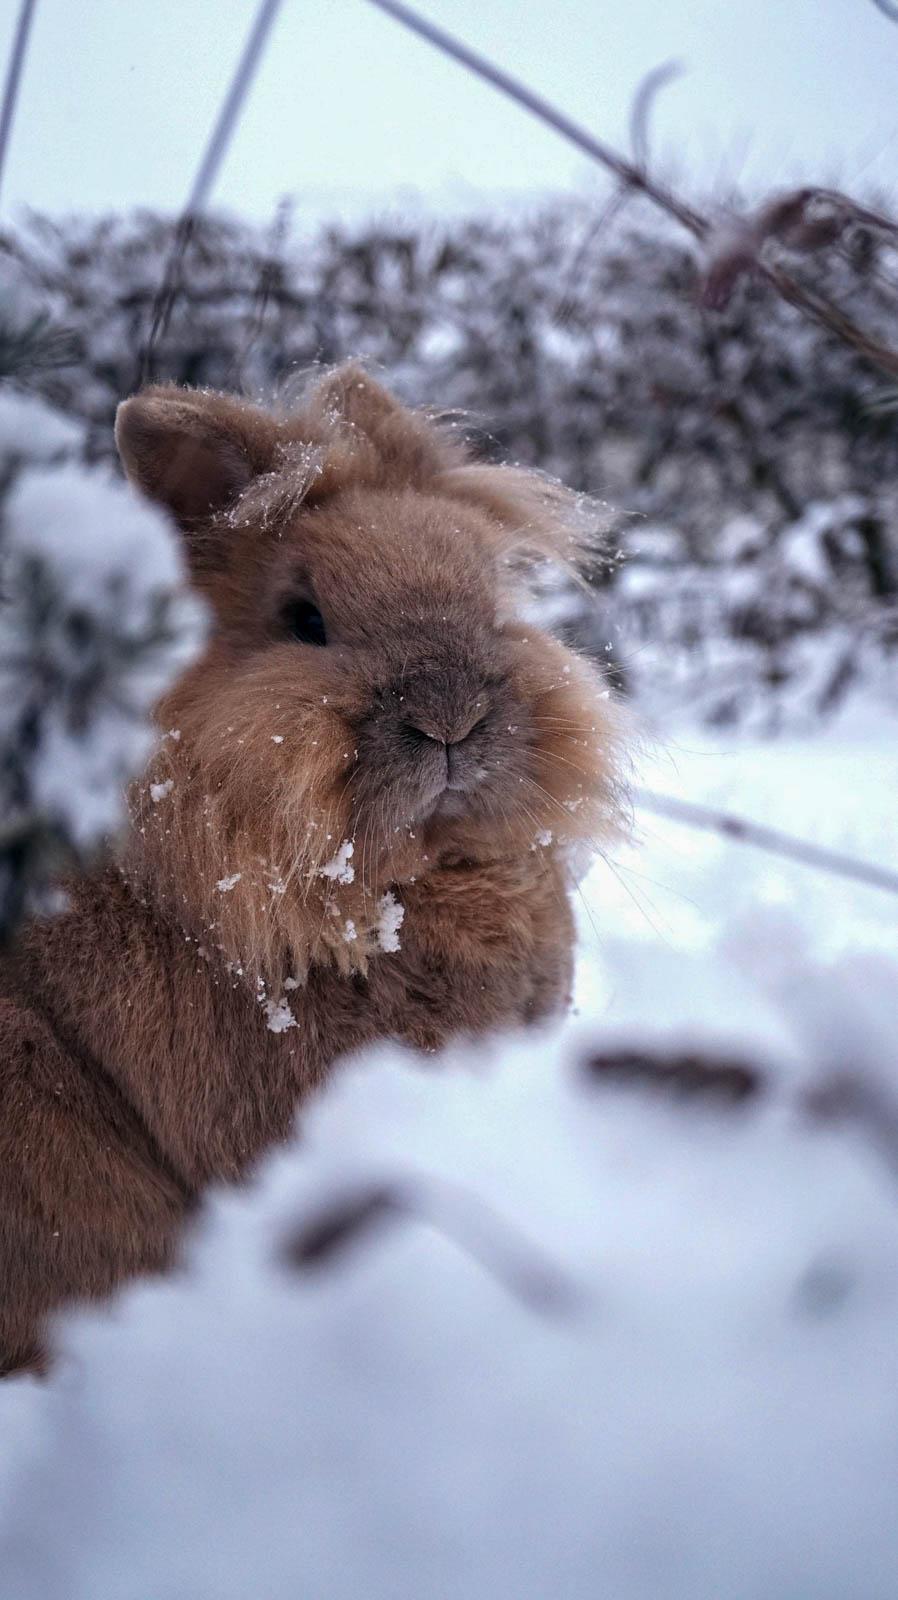 Lapin nain dans la neige